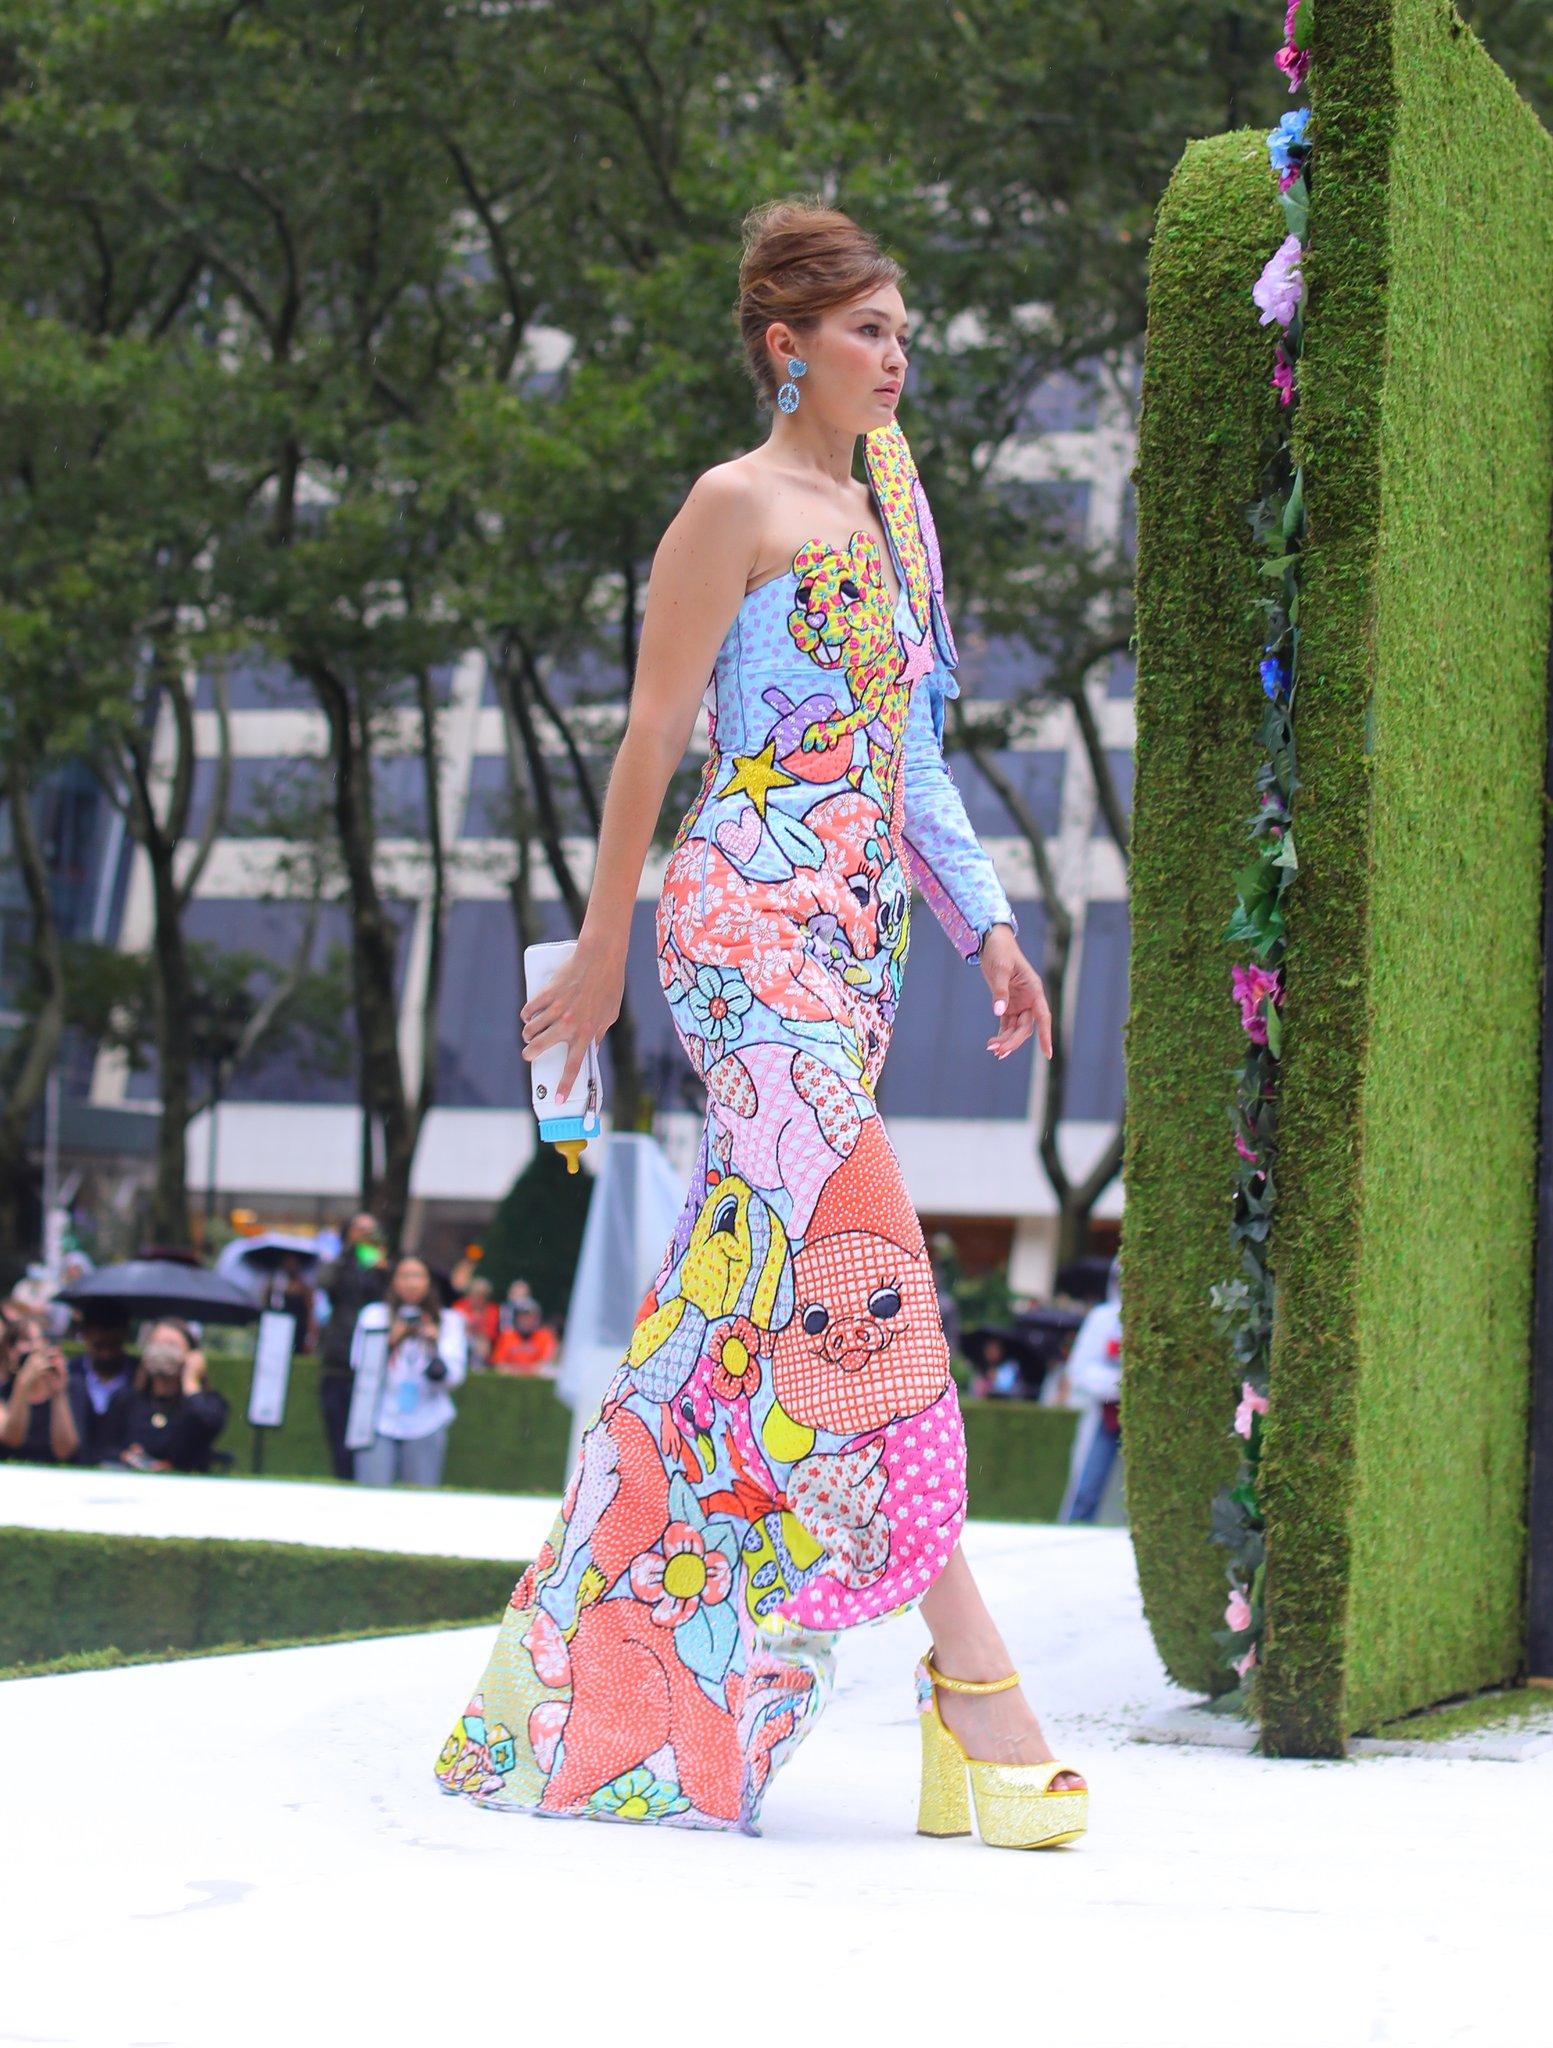 Gigi Hadid walking for Moschino Spring Summer 2022 in New York.